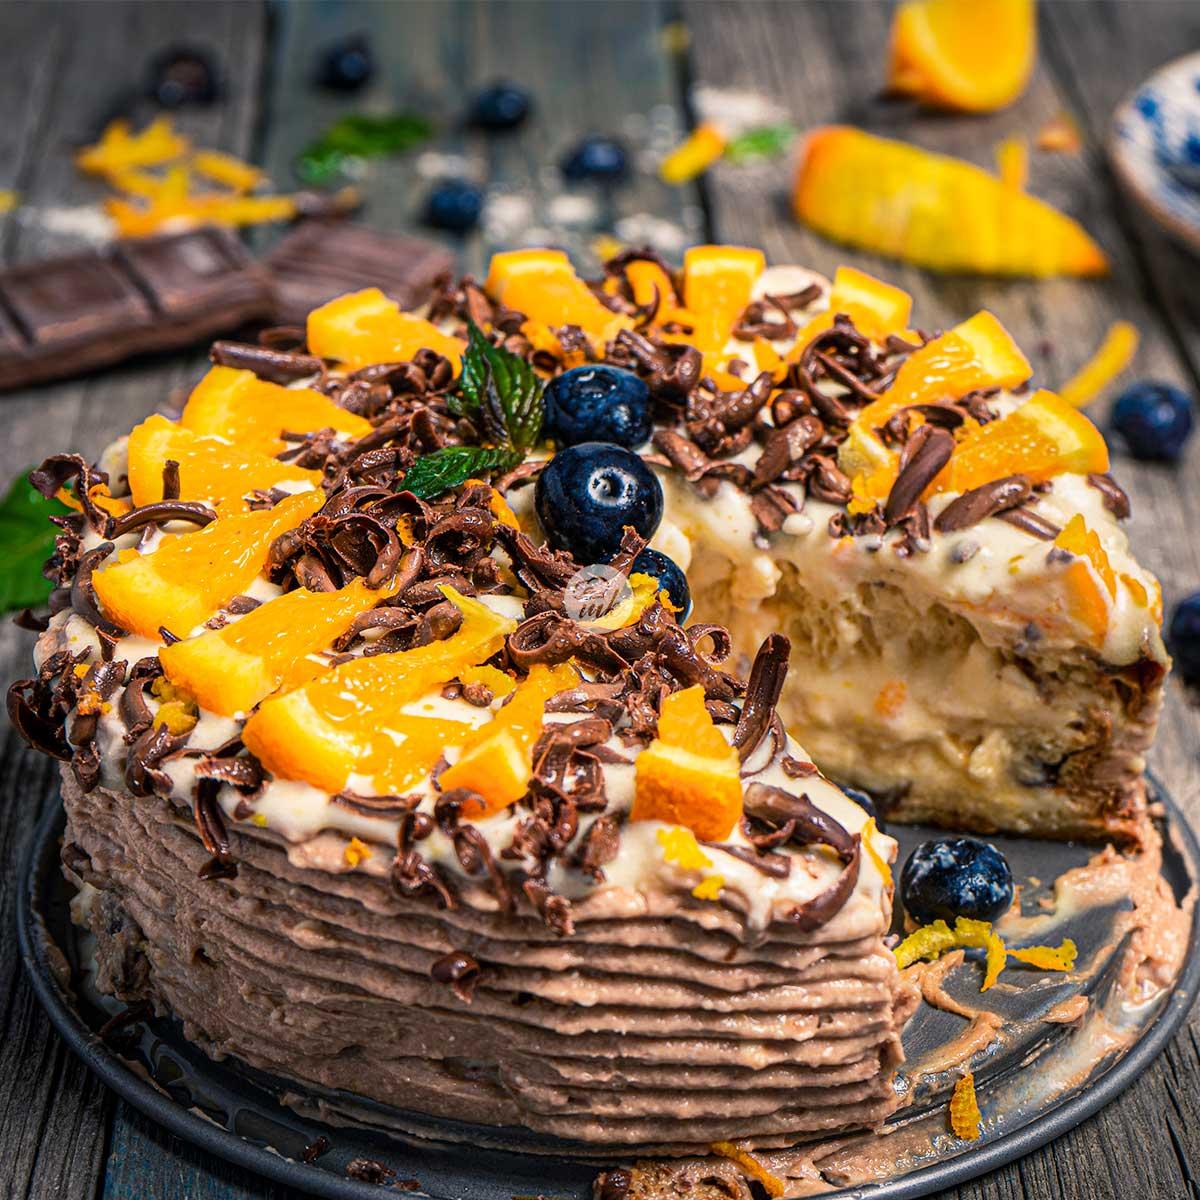 Великденска козуначена торта декорирана с пресни портокали и заснета отстрани